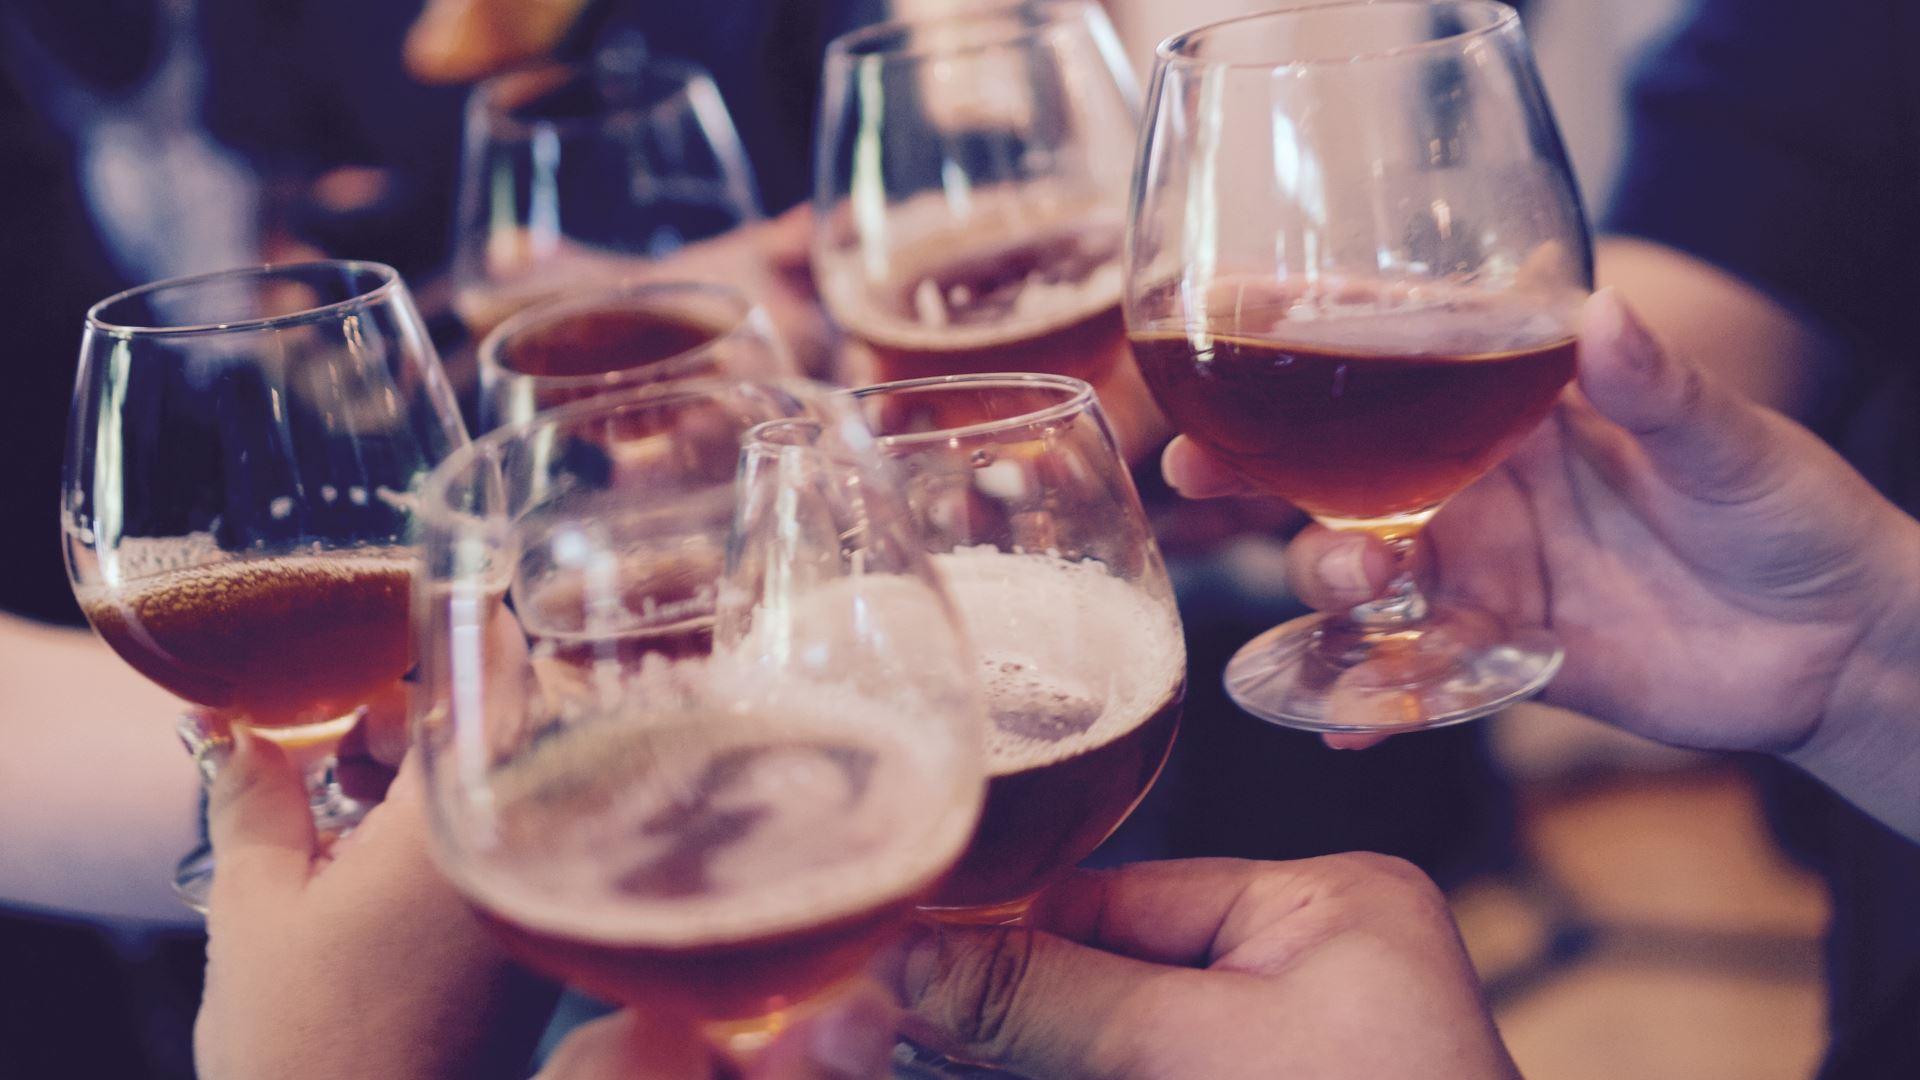 yutacar-drink-unsplash